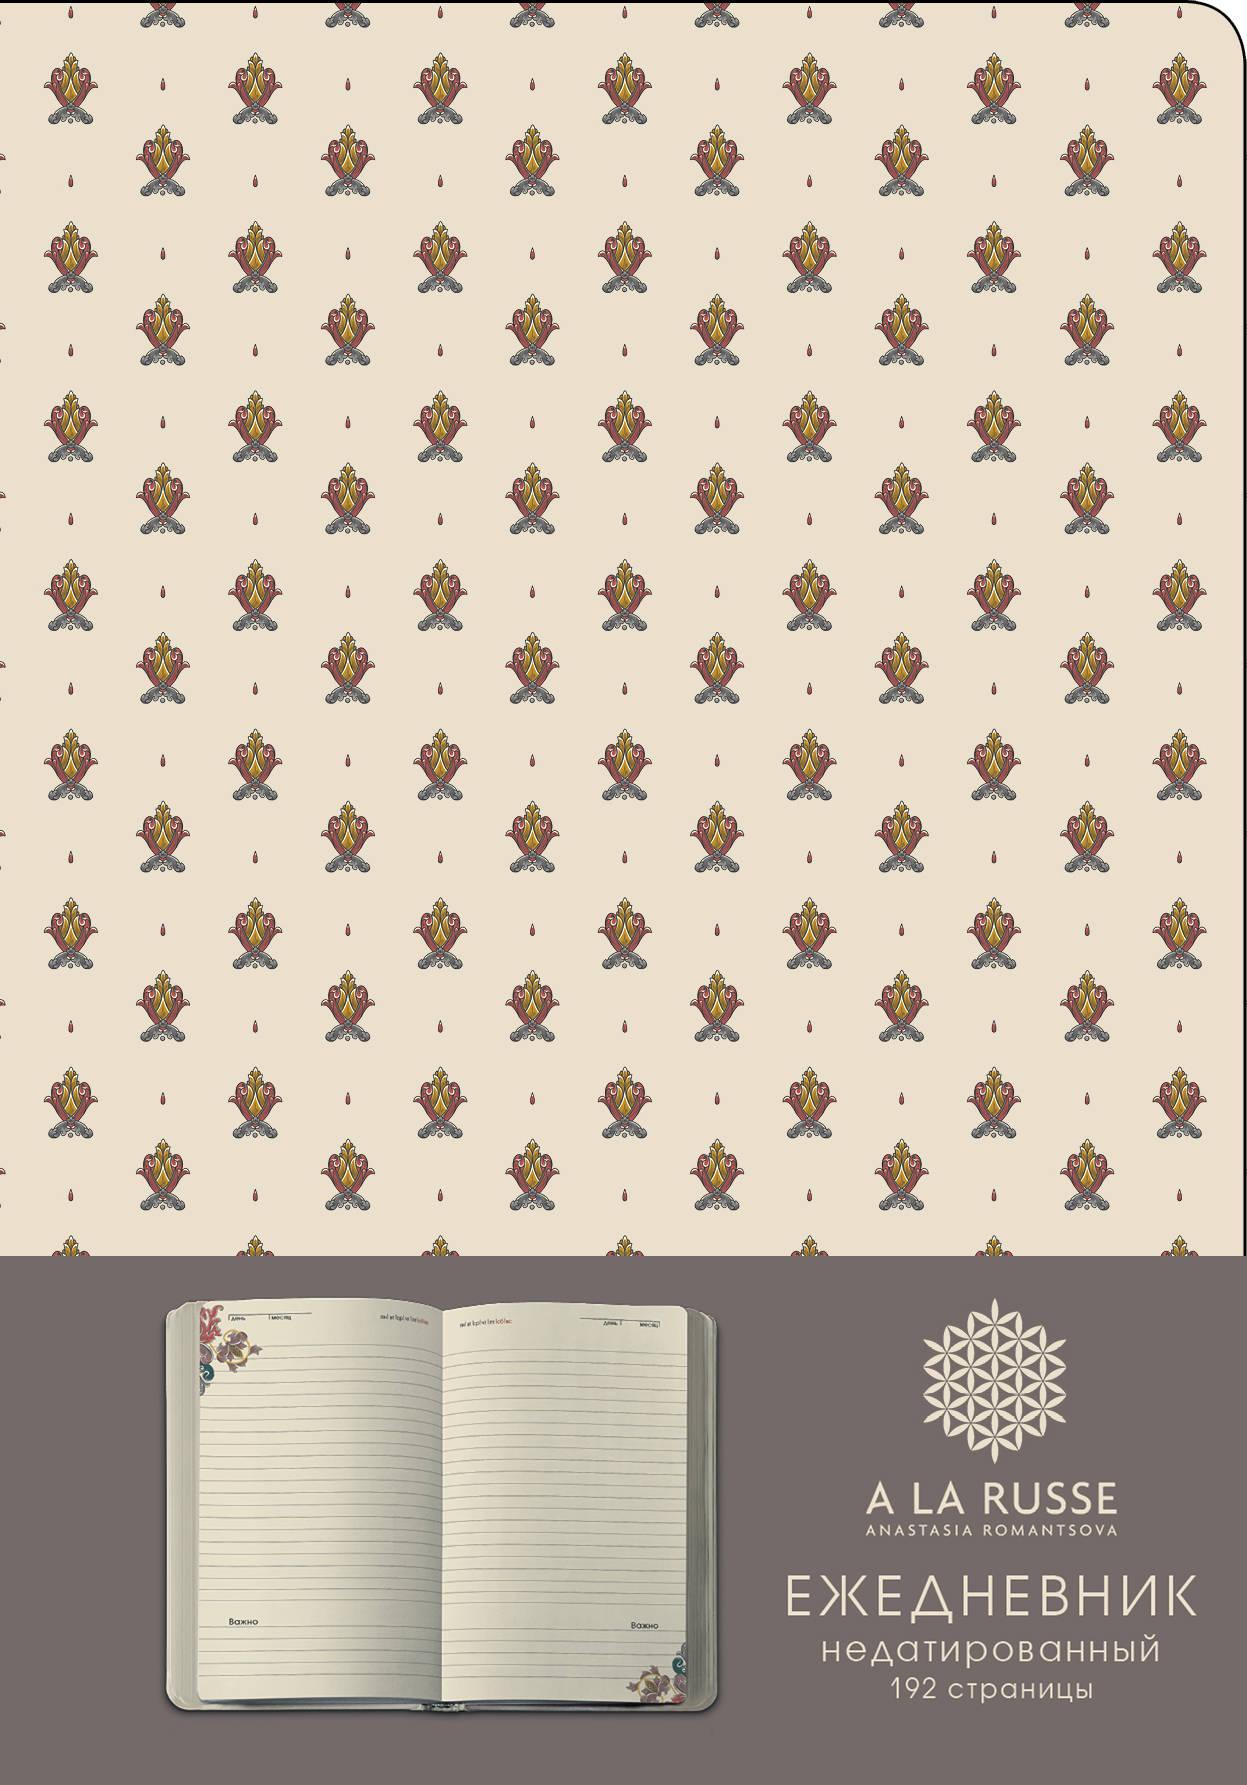 Фото - Ежедневник A LA RUSSE. Мелкий орнамент (формат А5, недатированный) (Арте) блокнот a la russe орнамент скругленные углы ляссе арте a5 192 стр